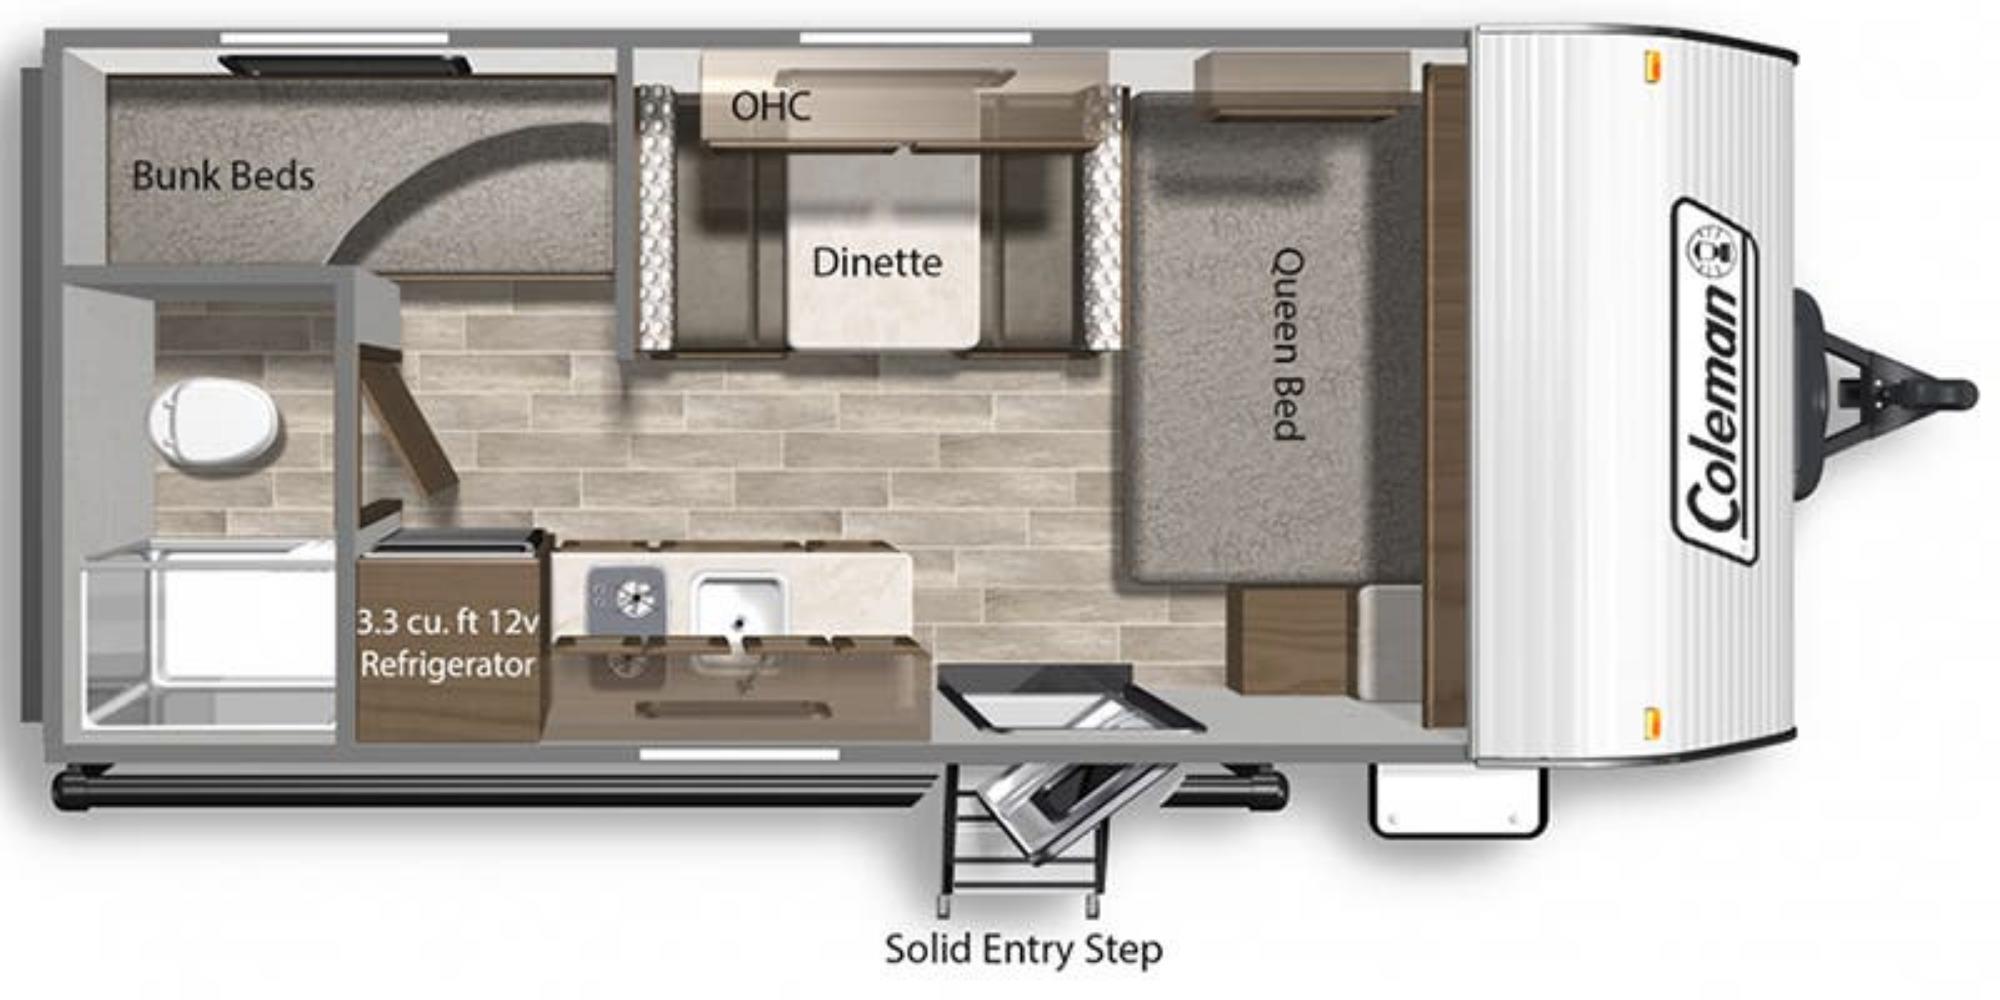 View Floor Plan for 2021 COLEMAN COLEMAN LANTERN LT 17B